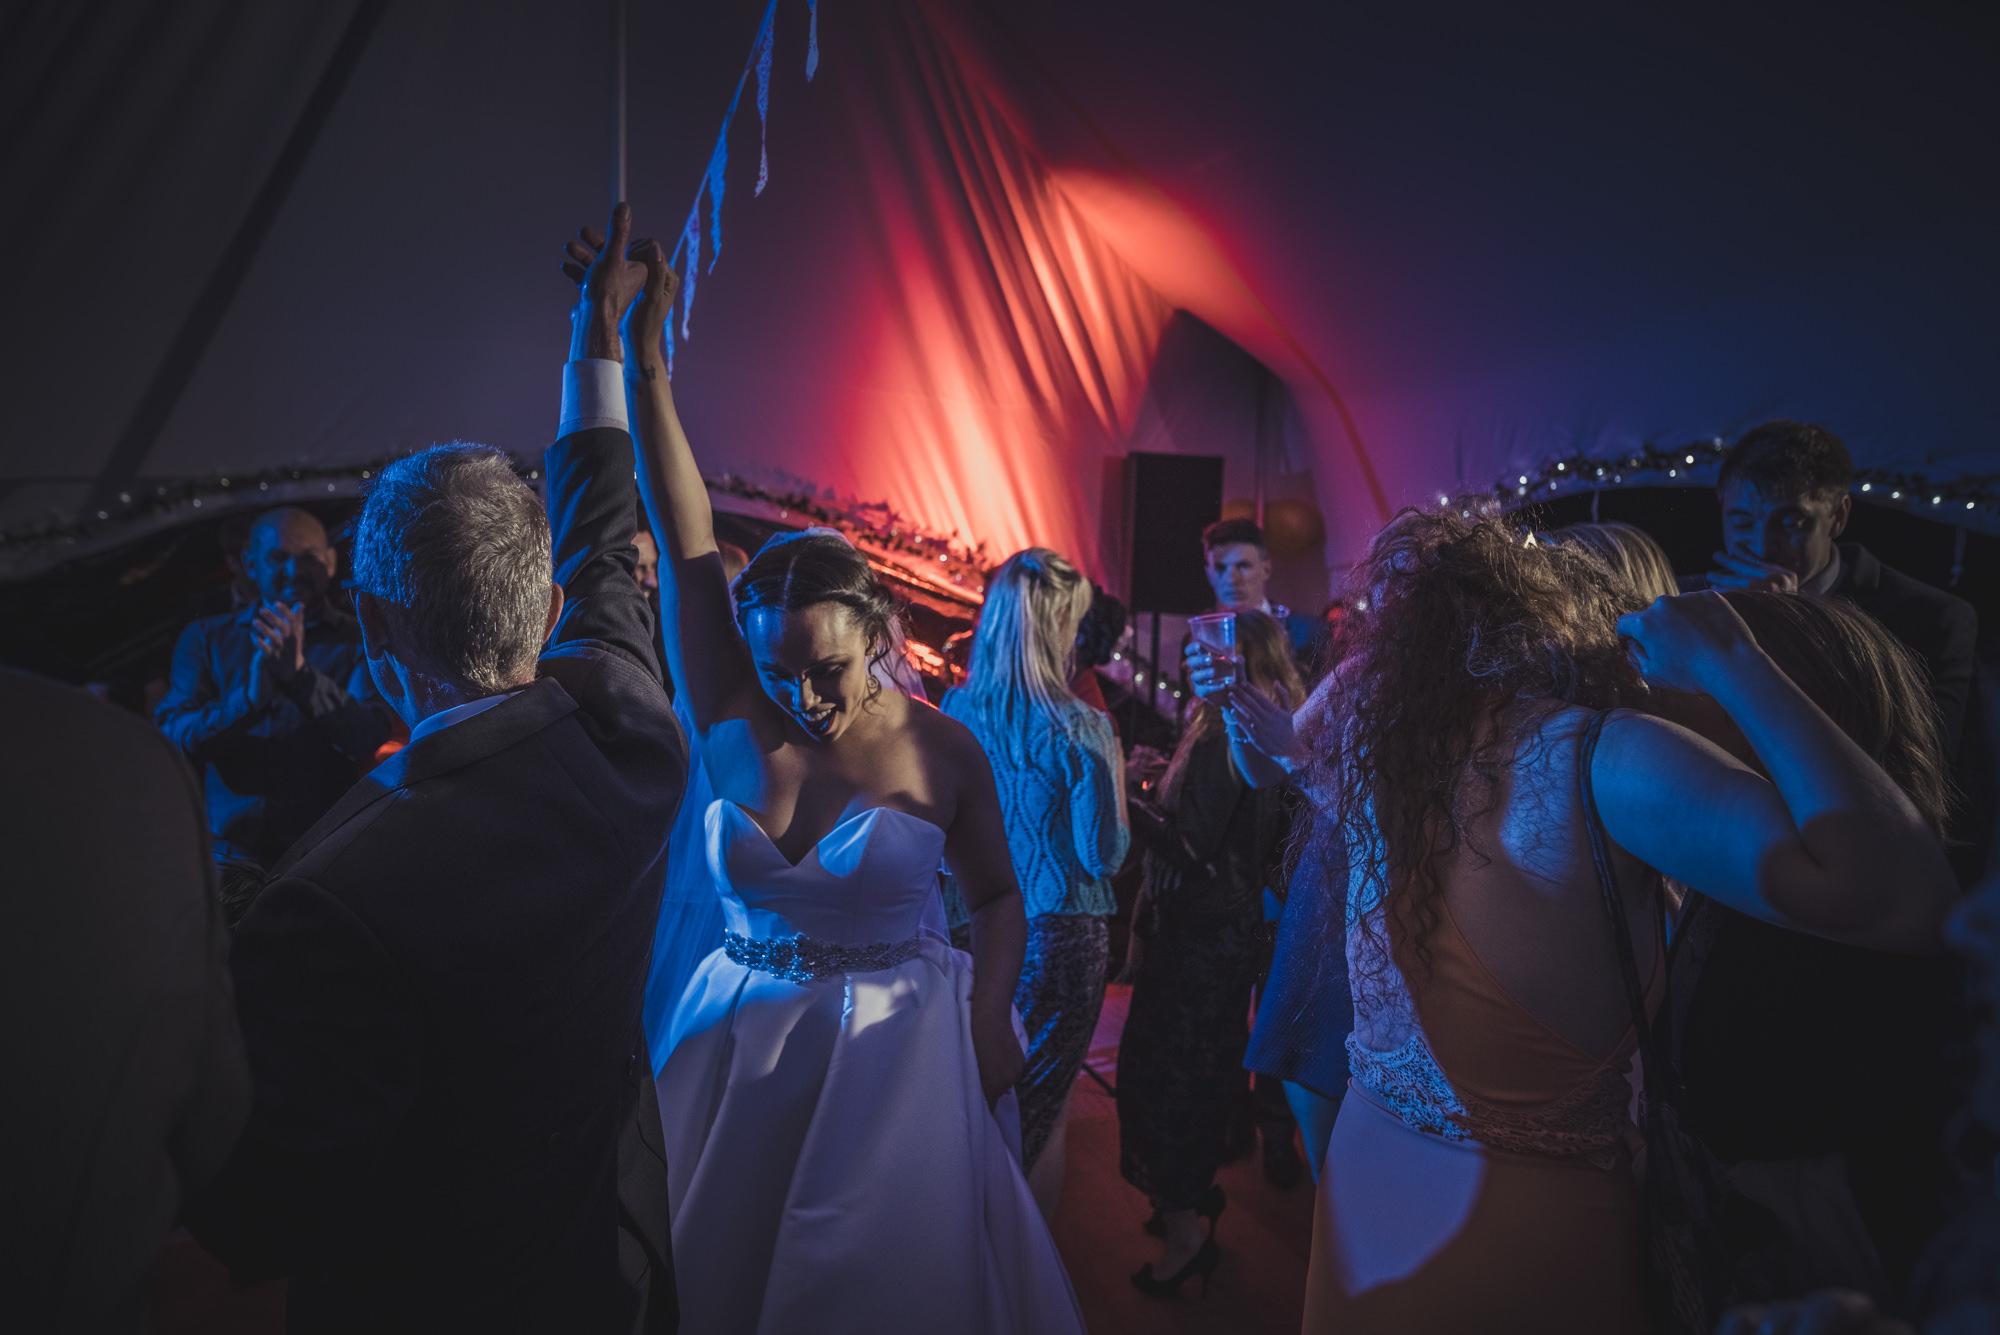 Jacqueline-Gareth-Wedding-Westmead-Events-Surrey-Manu-Mendoza-Wedding-Photography-570.jpg